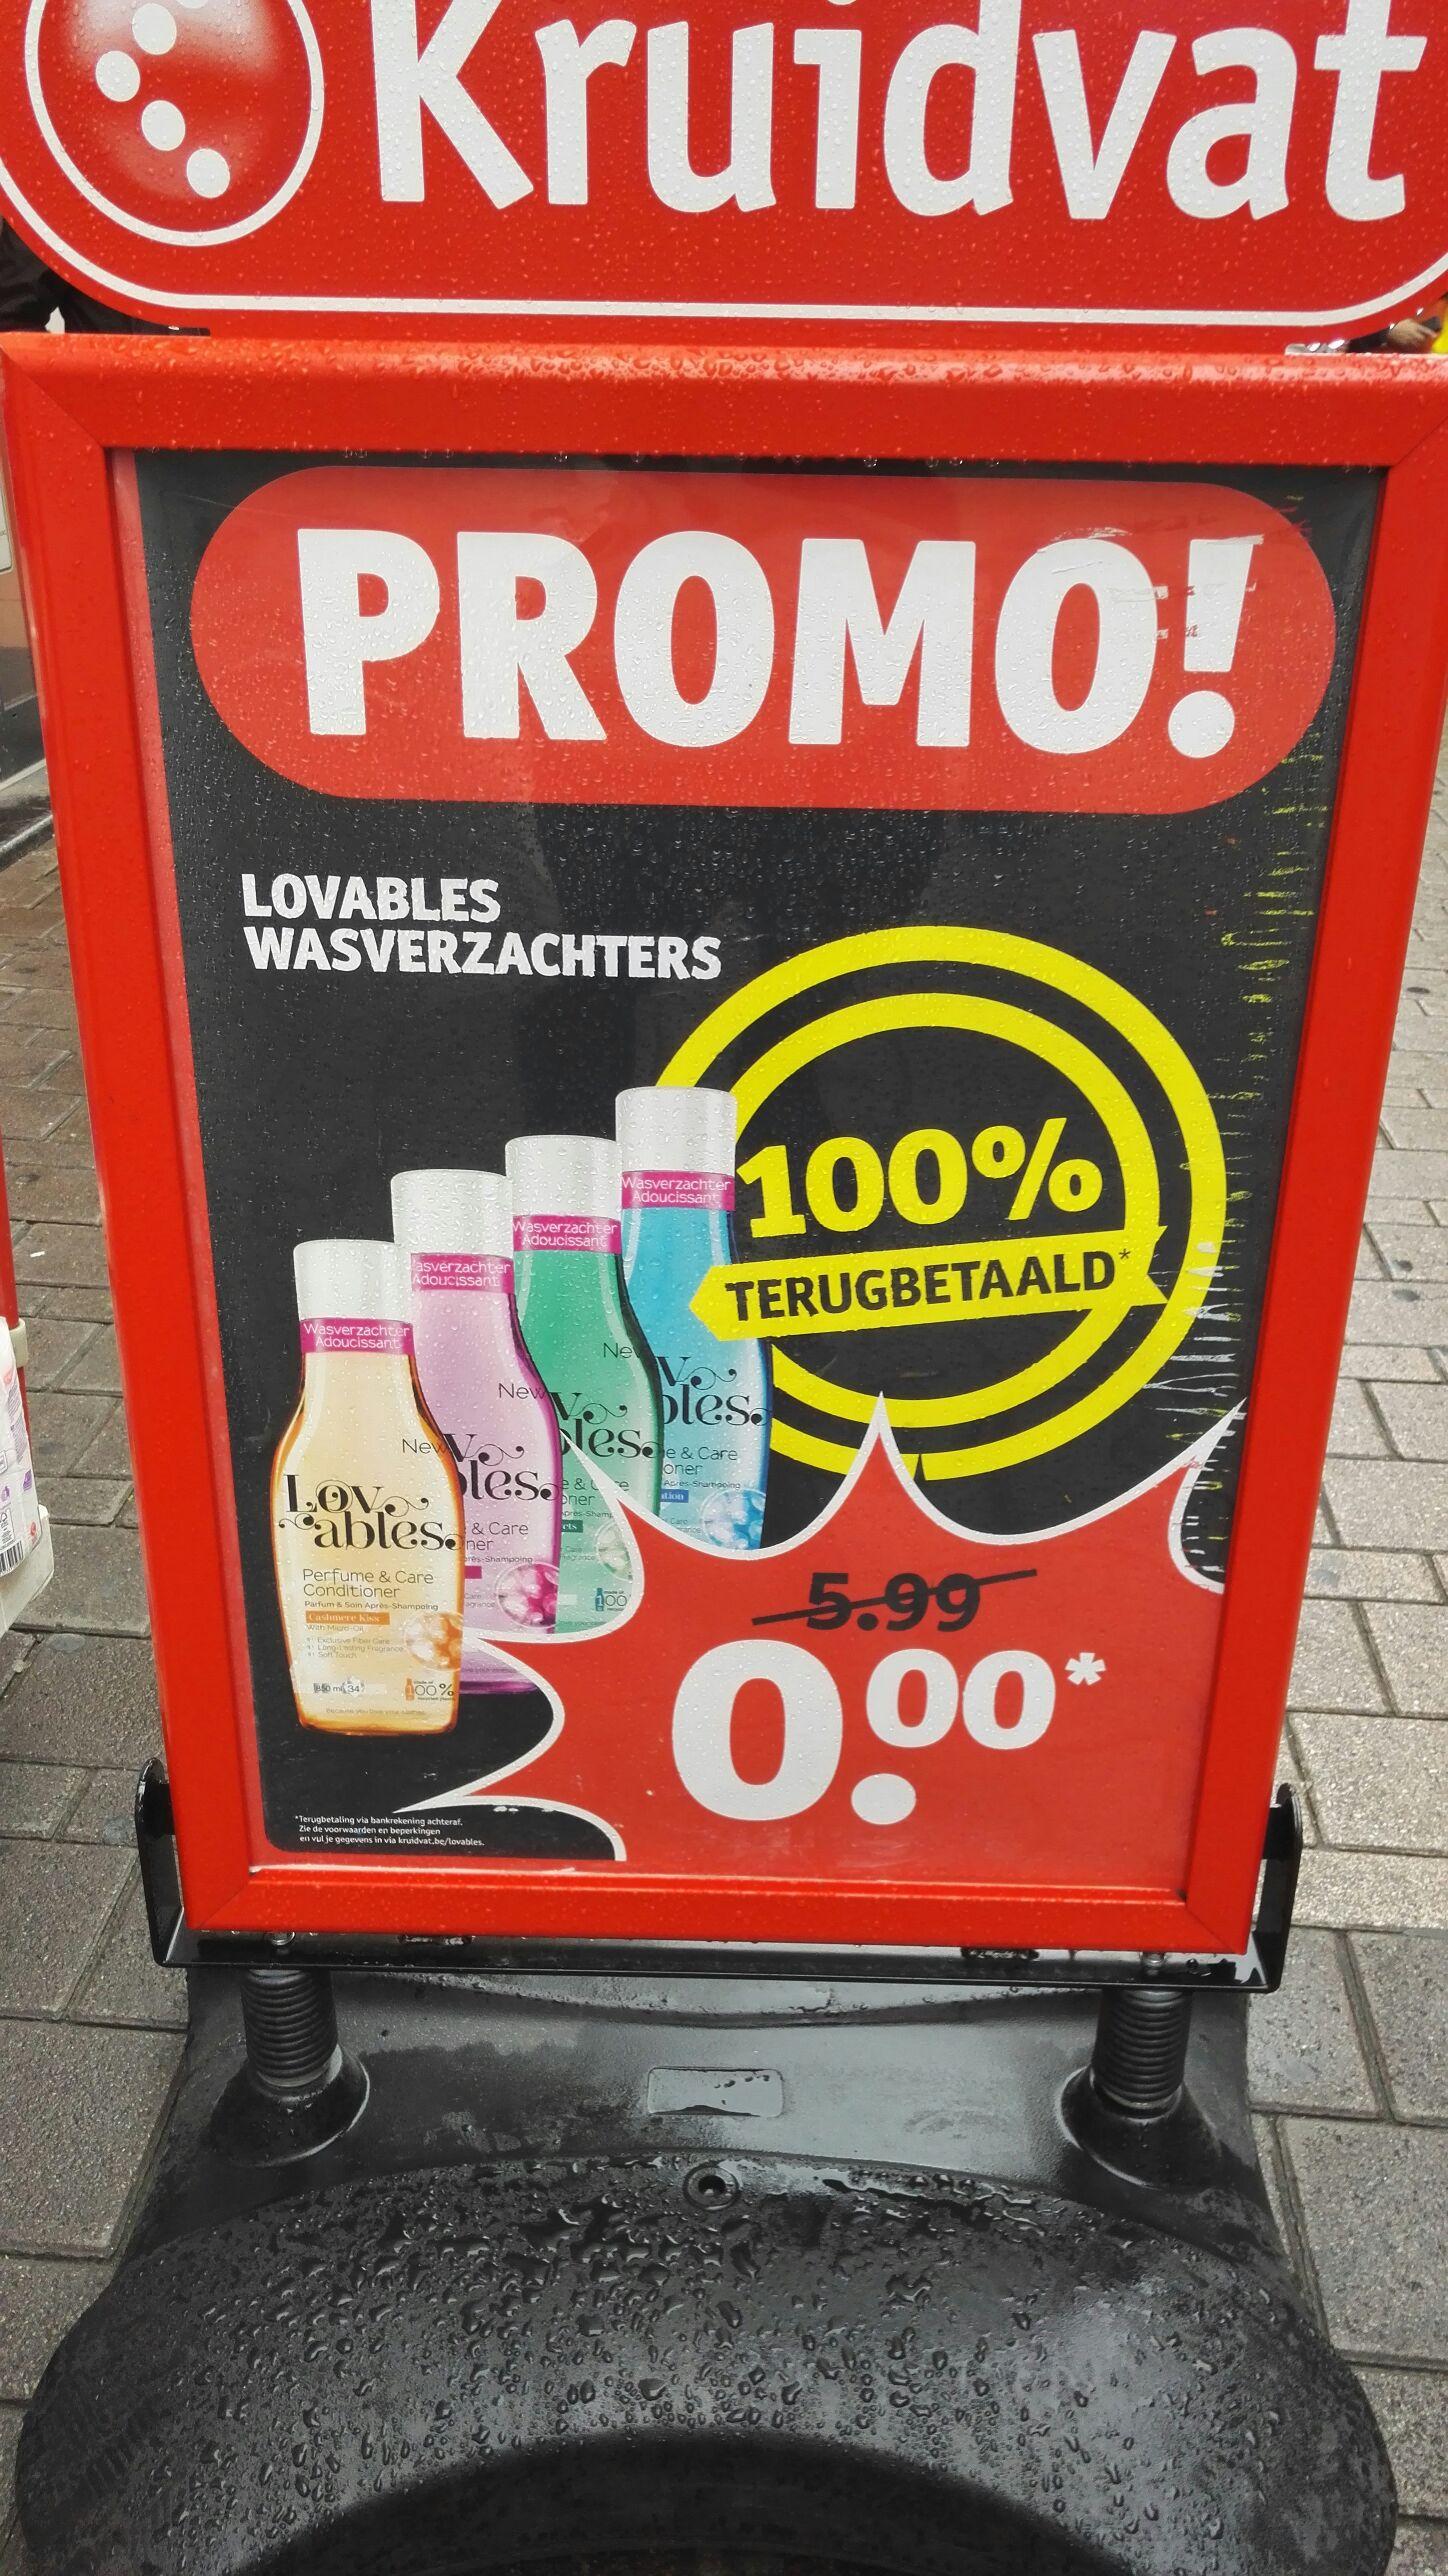 [Grensdeal] België: Gratis Lovables wasverzachter @ Kruidvat